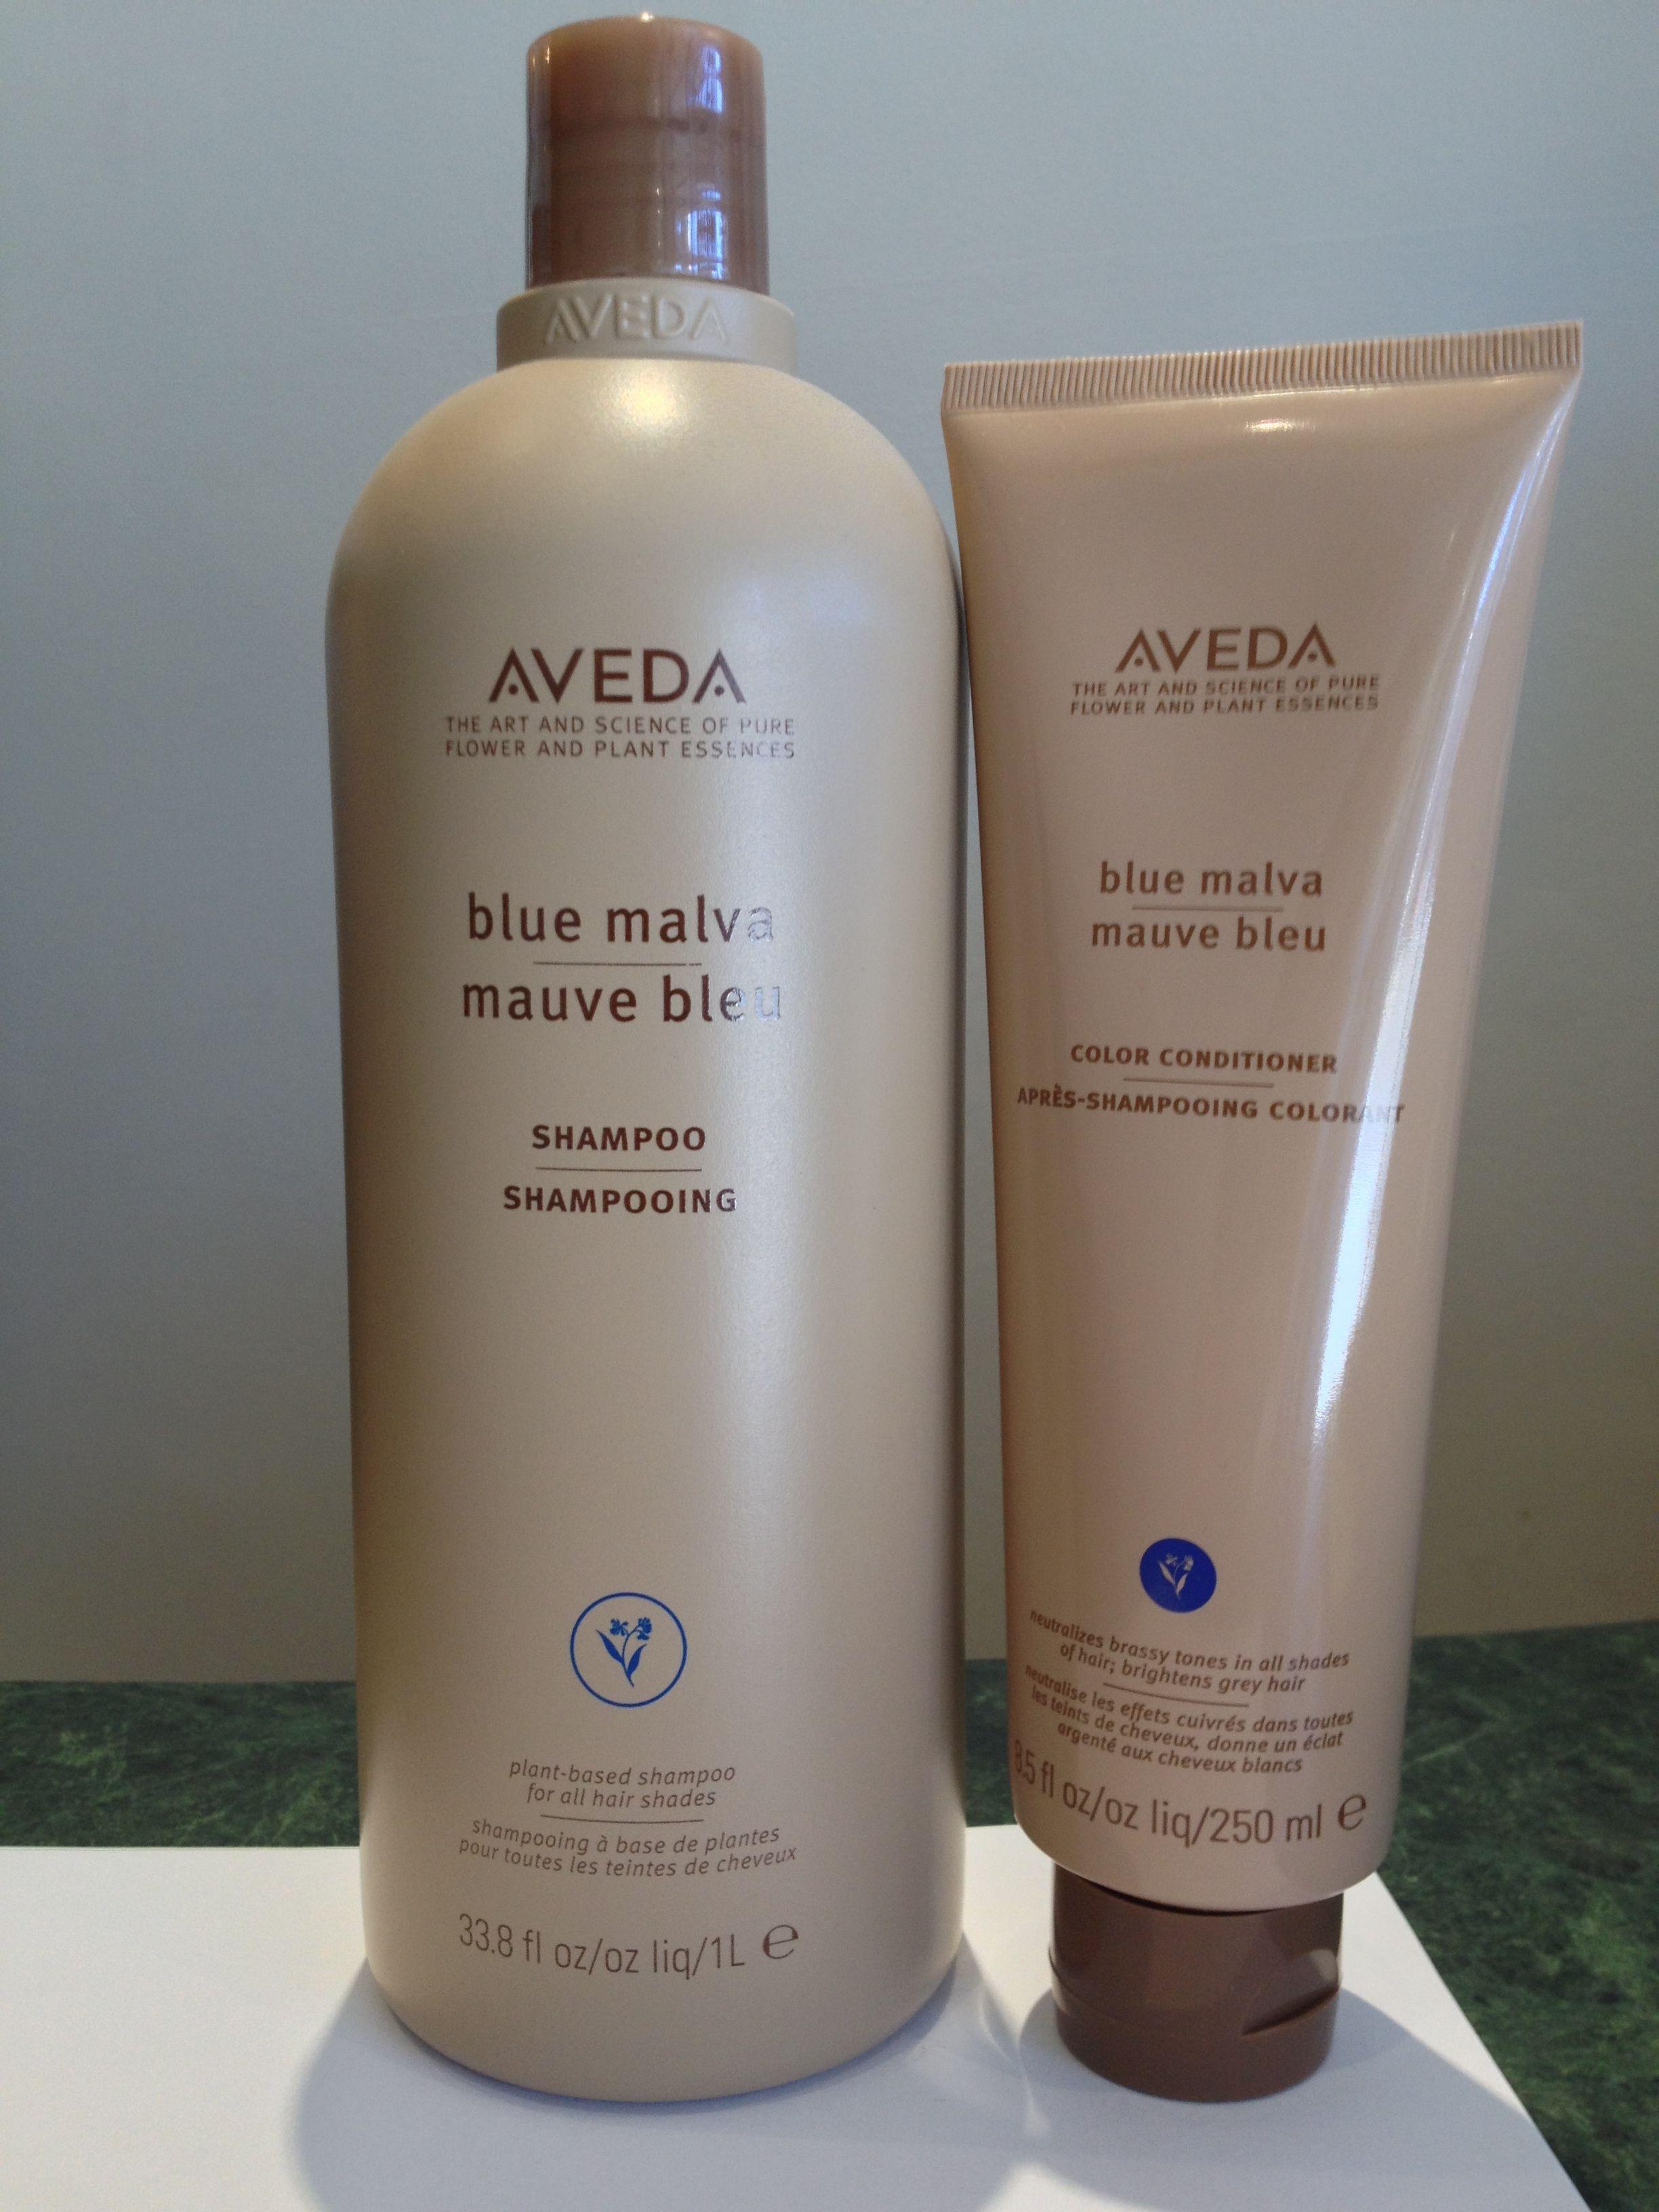 shampoo hair grey conditioner shiny malva adds aveda silky brassy gray tones colour brightness silvery shades visit colors neutralizes amp